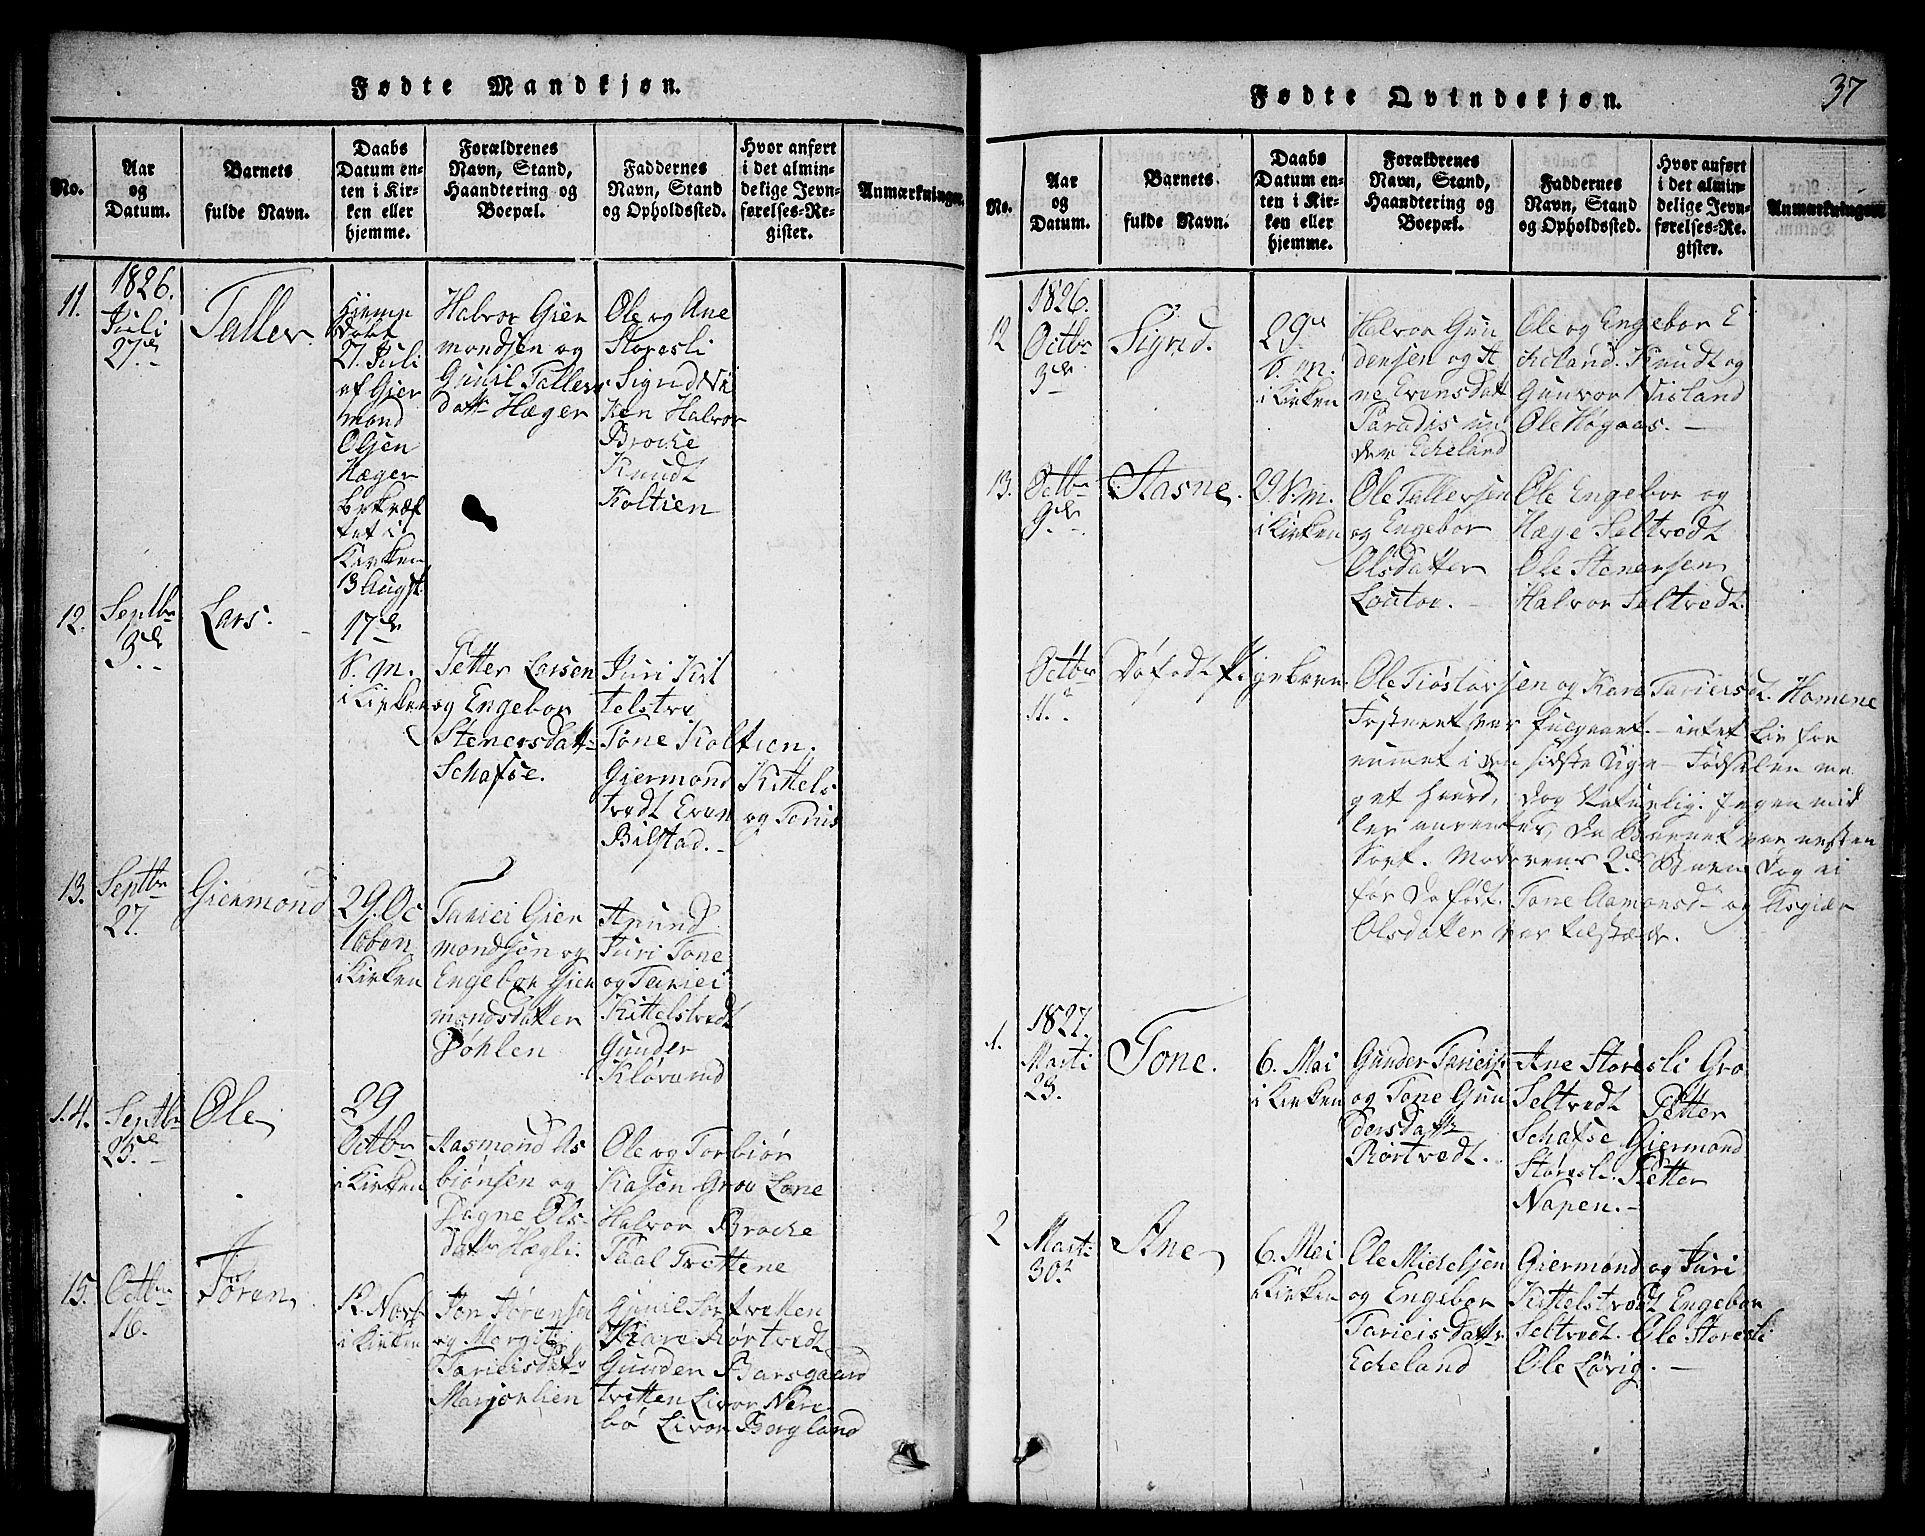 SAKO, Mo kirkebøker, G/Gb/L0001: Klokkerbok nr. II 1, 1814-1843, s. 37